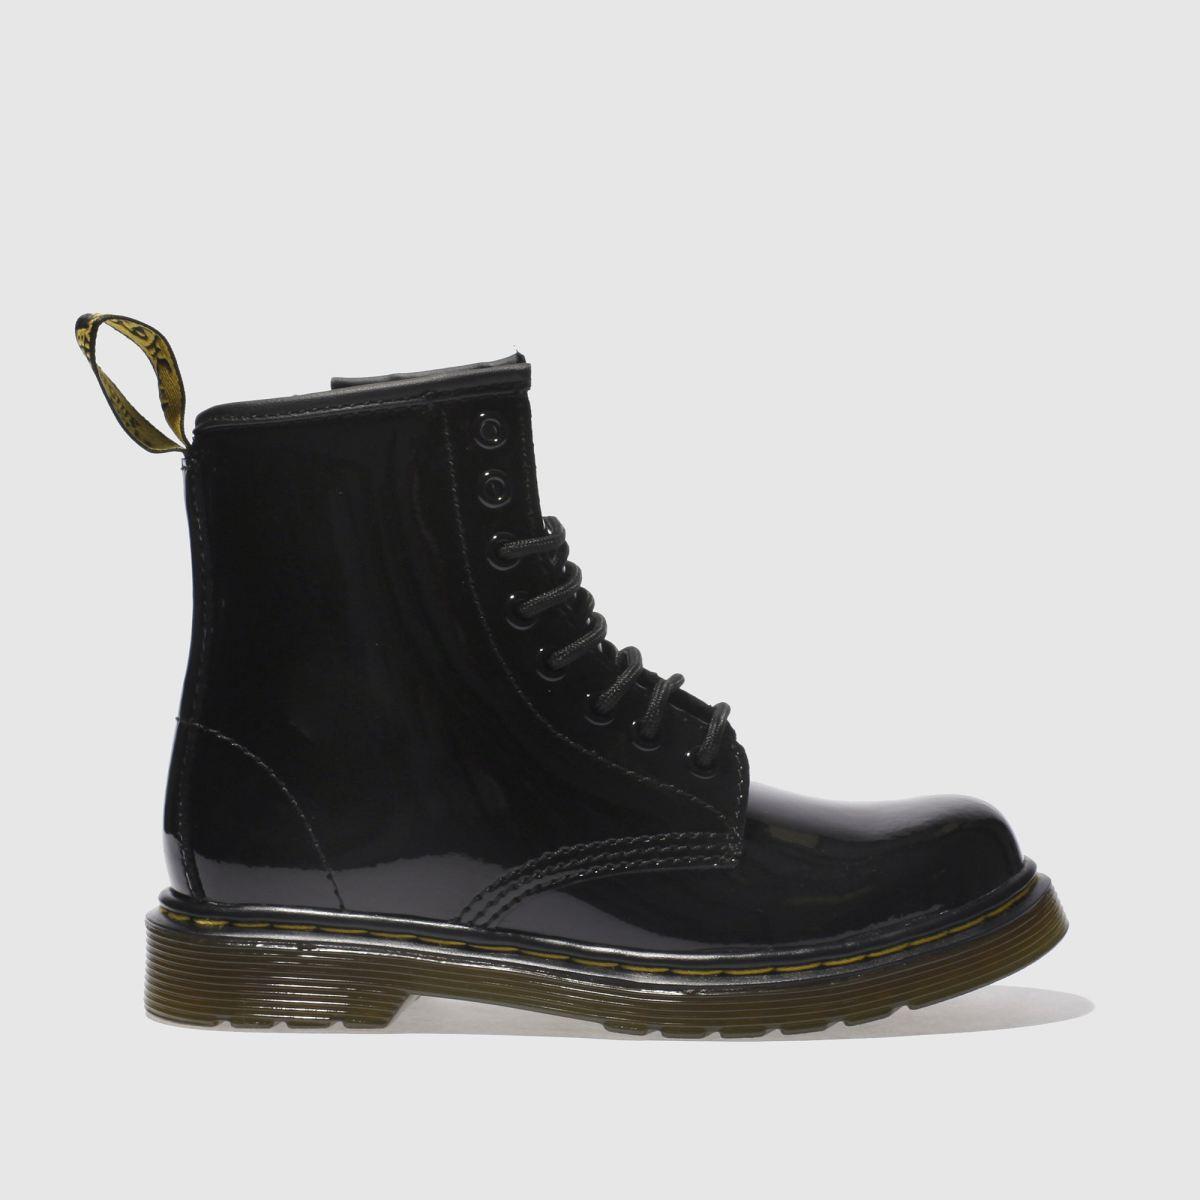 Dr Martens Black 1460 Girls Junior Boots